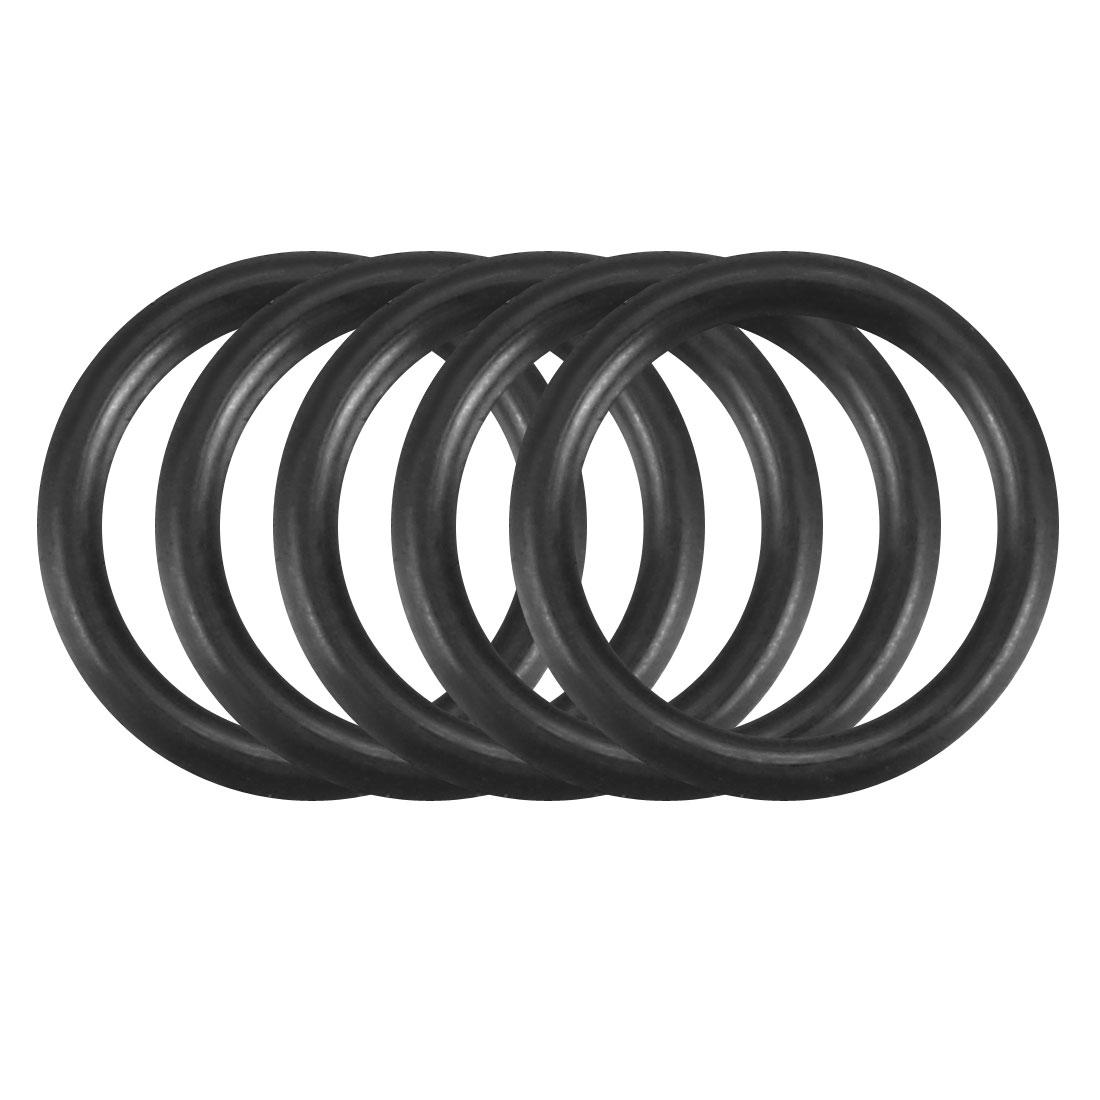 100Pcs Black 8mm x 1mm Nitrile Rubber O Ring NBR Oil Sealing Grommets